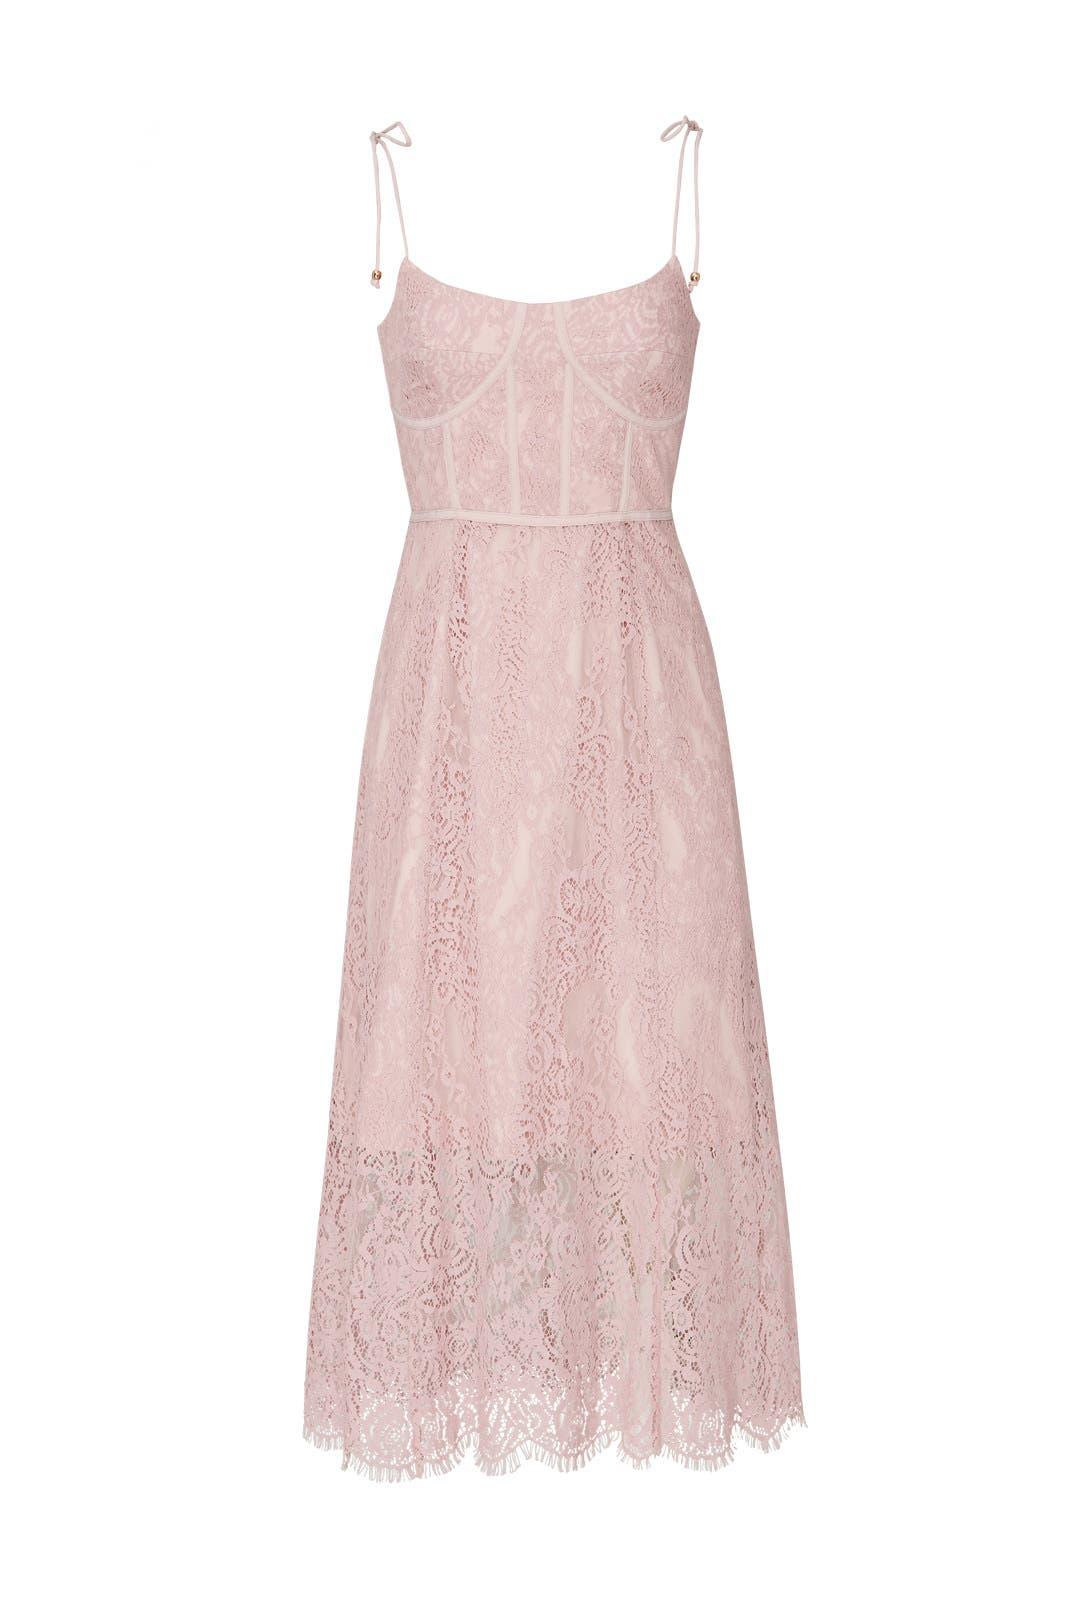 Sense Dress by Keepsake